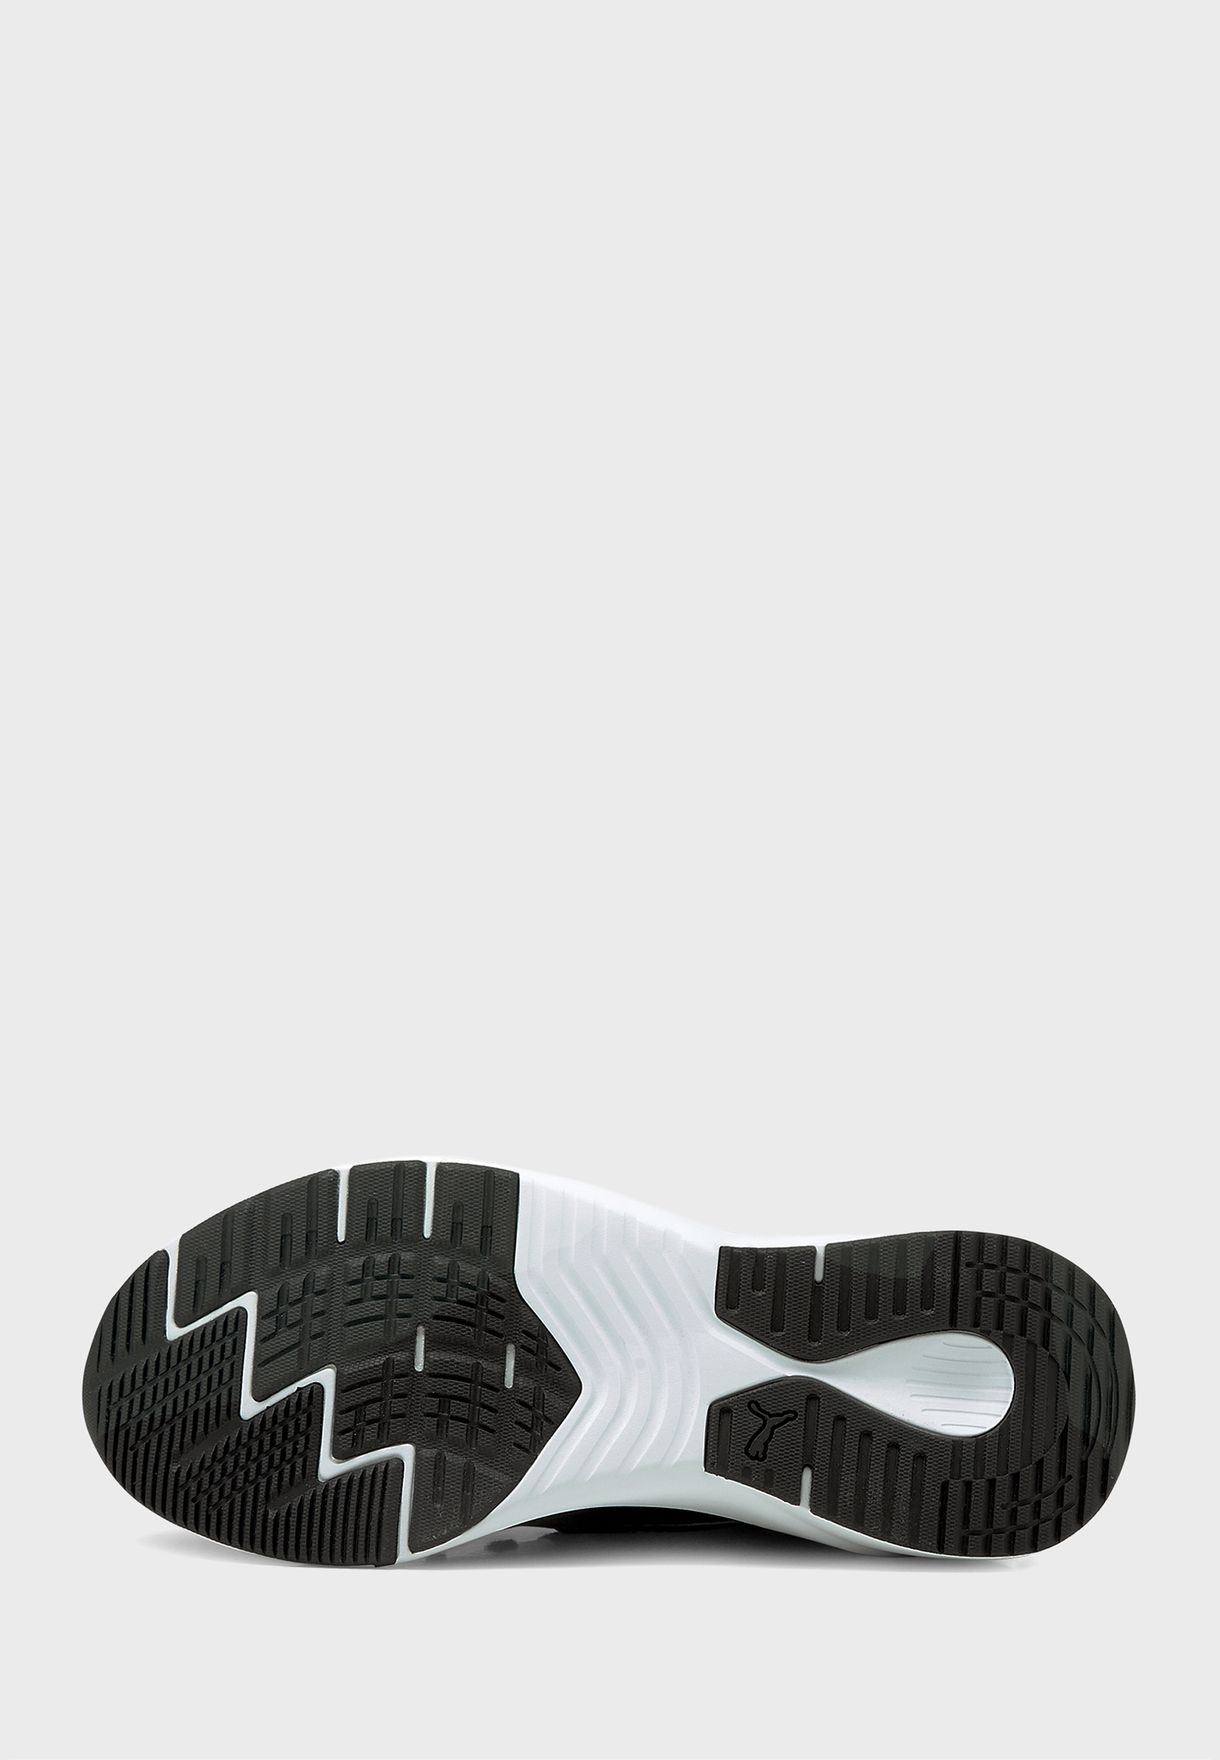 حذاء فورايفر اكس تي